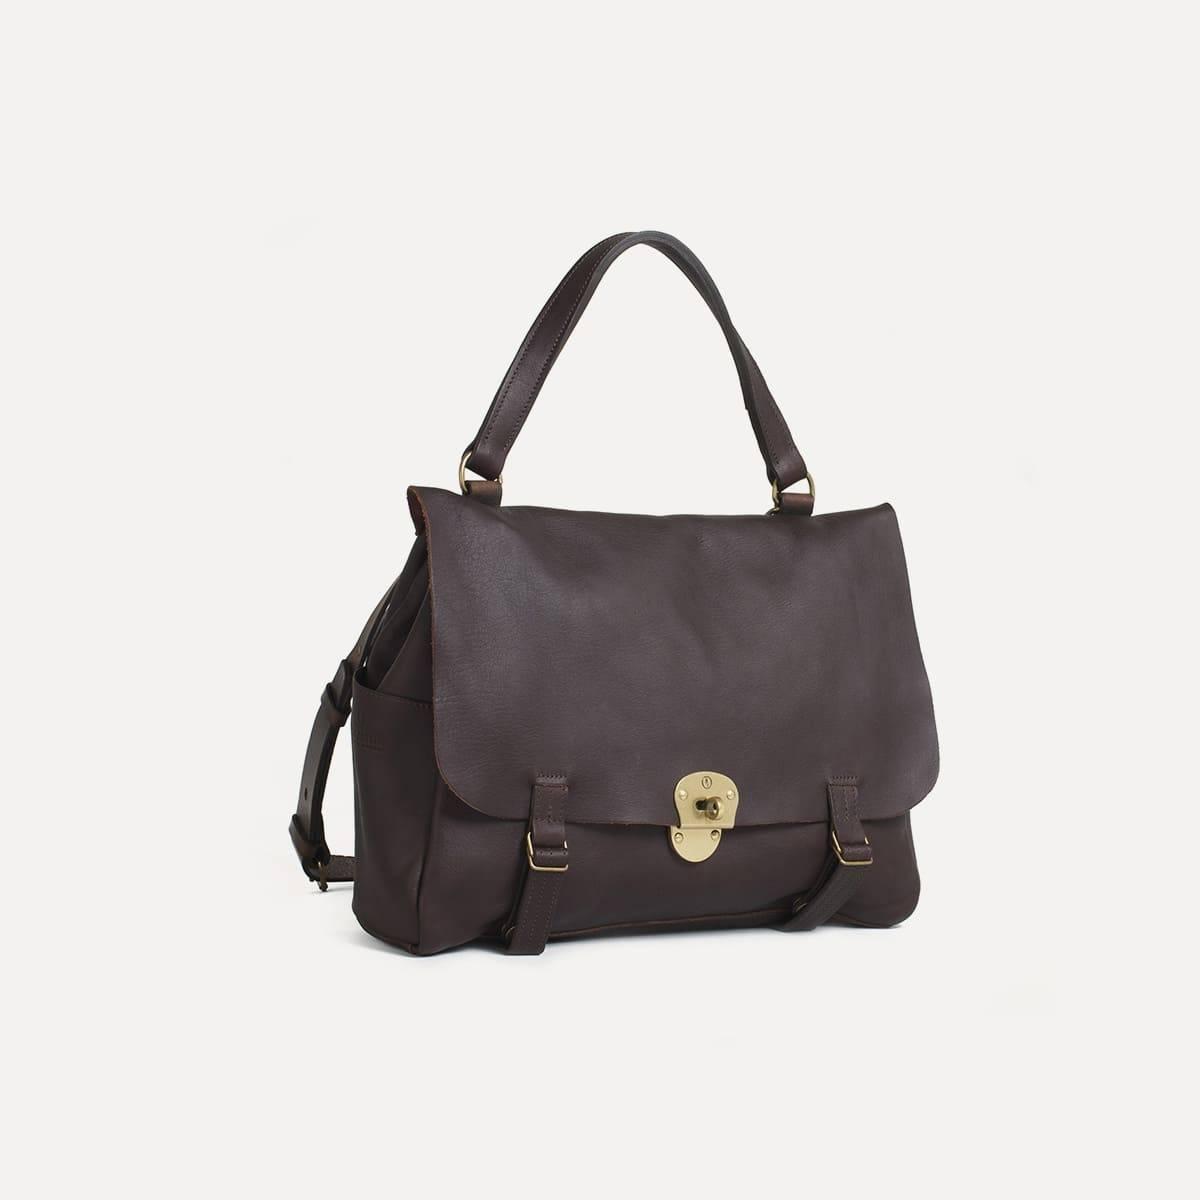 Coline bag M - Peat (image n°3)